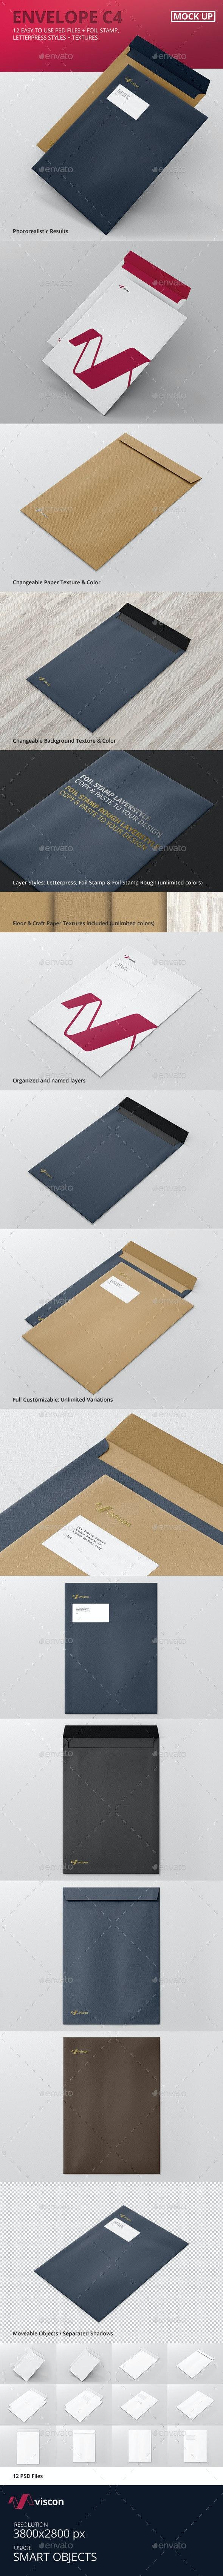 Envelope C4 Mock-Ups - Stationery Print